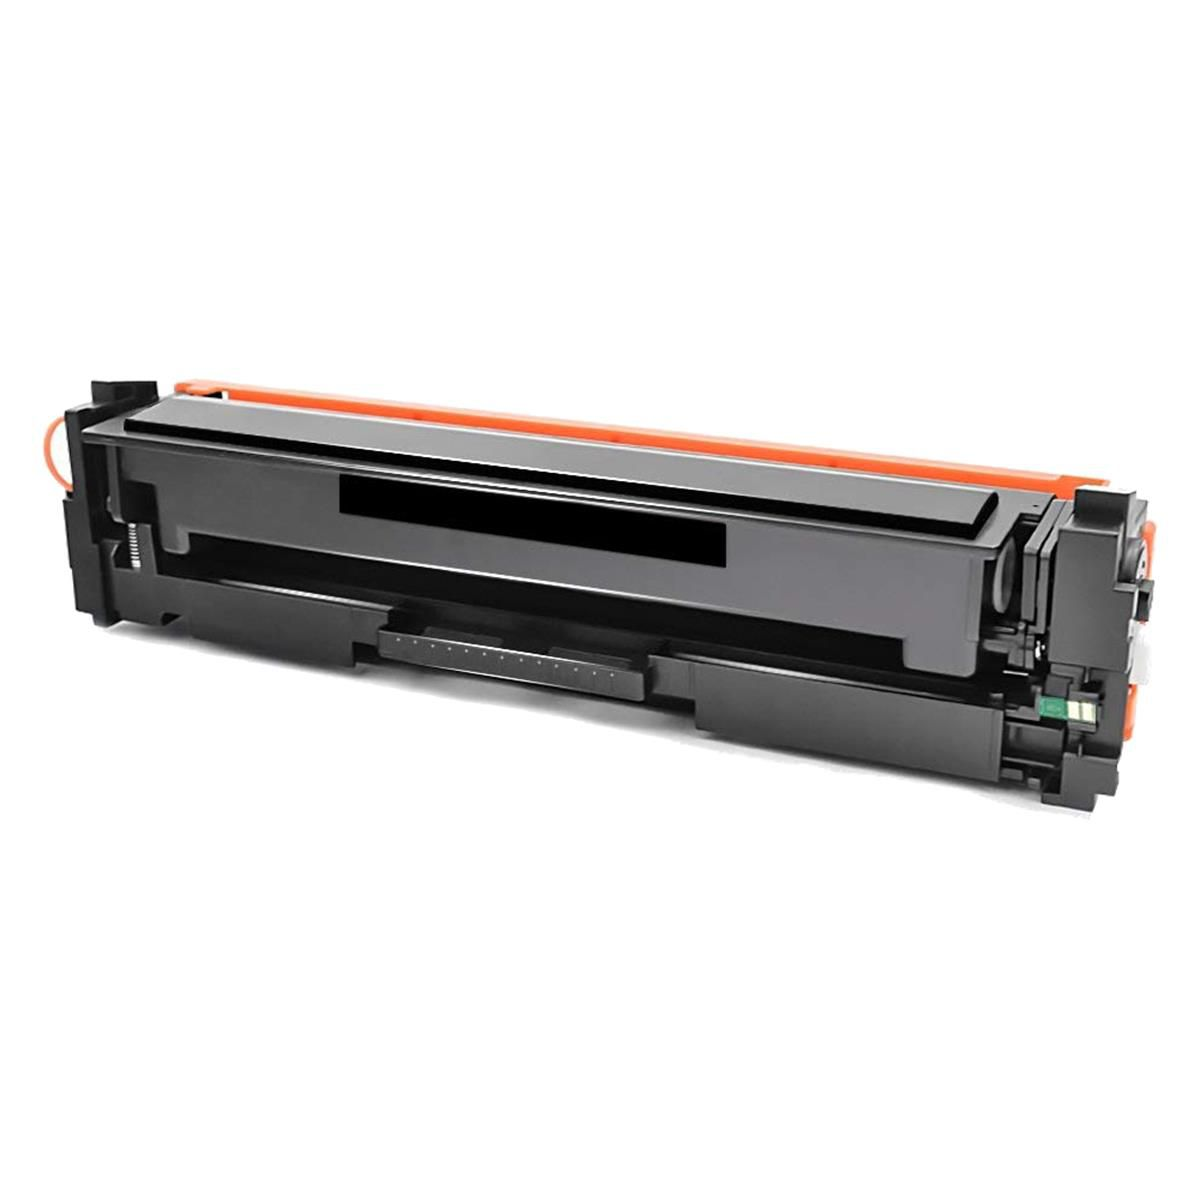 Toner Compatível com HP CF510A CF530A Black 900 Páginas - Cartucho & Cia